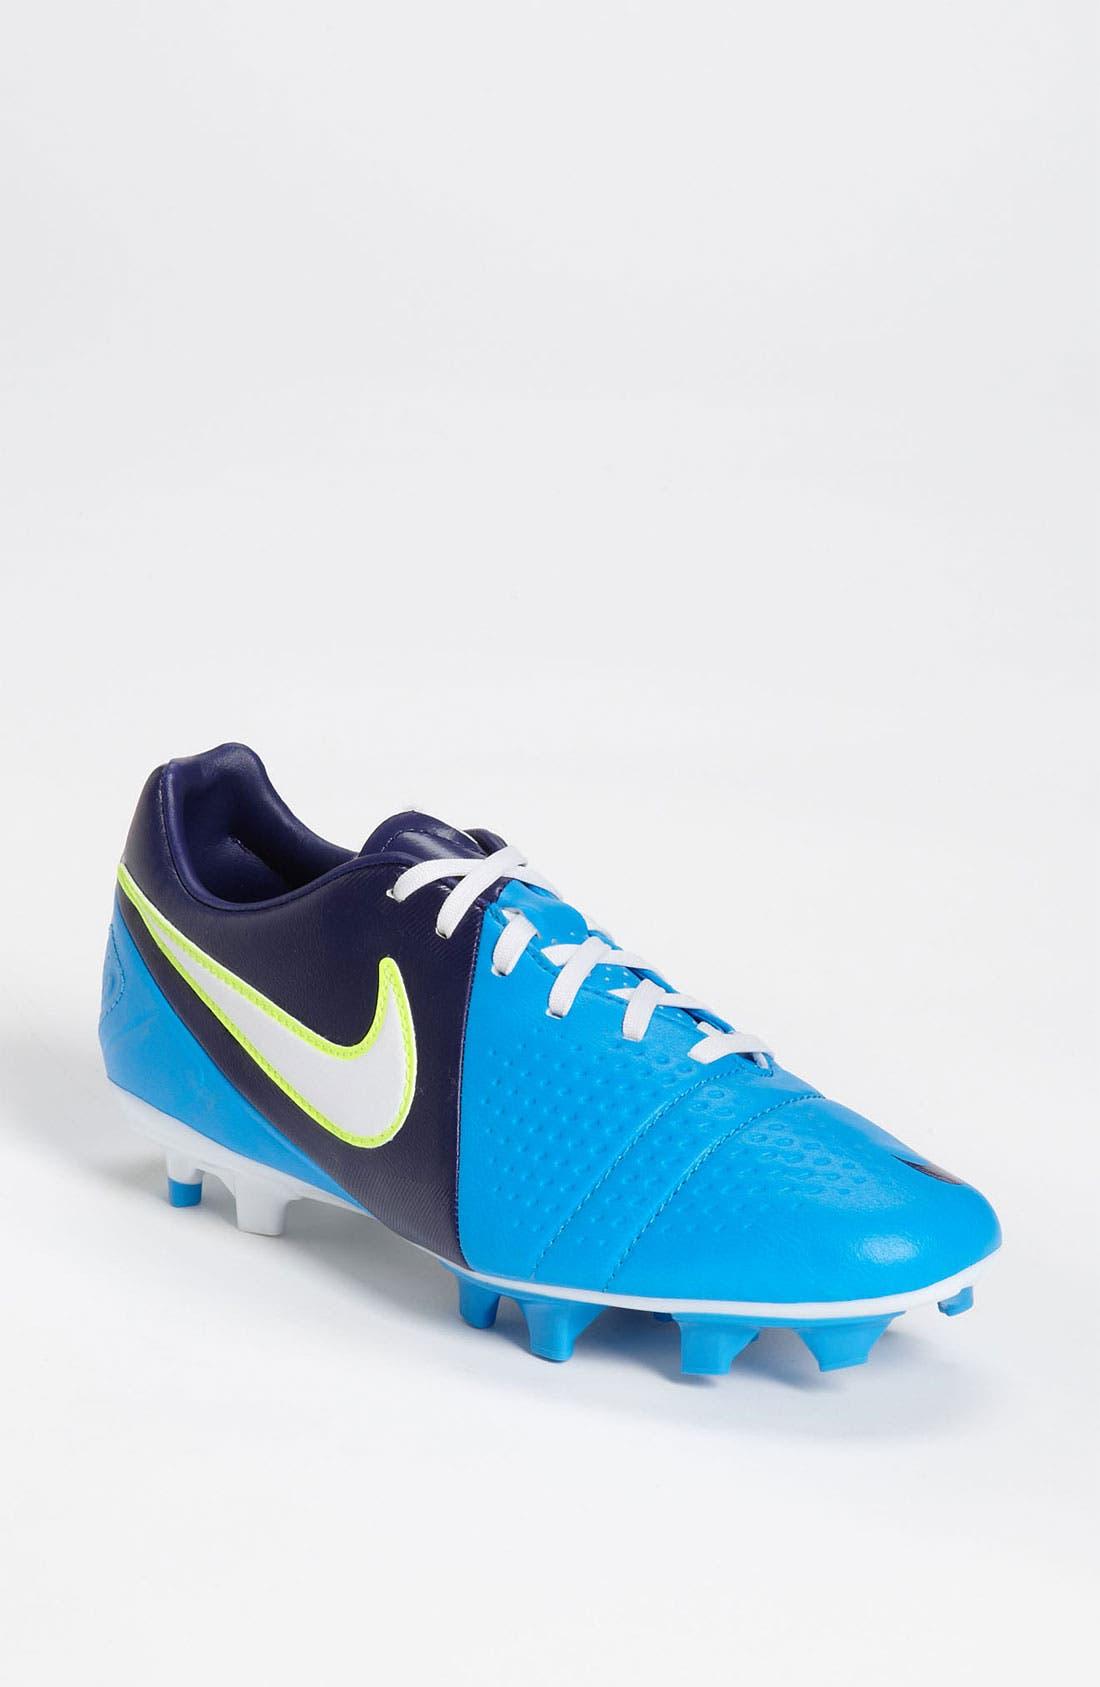 Alternate Image 1 Selected - Nike 'CTR360 Libretto 111' Soccer Shoe (Women)